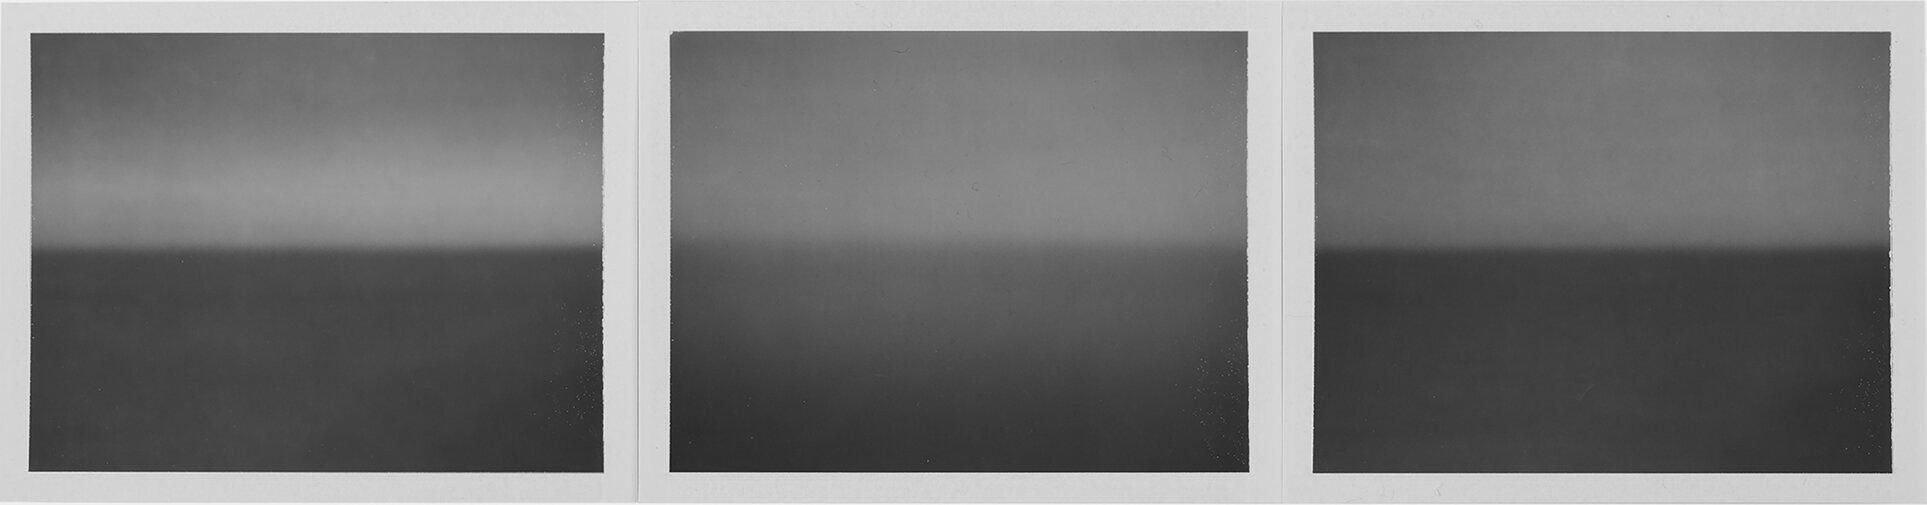 Thomas Paquet - Horizon, étude noir et blanc #7, 2015